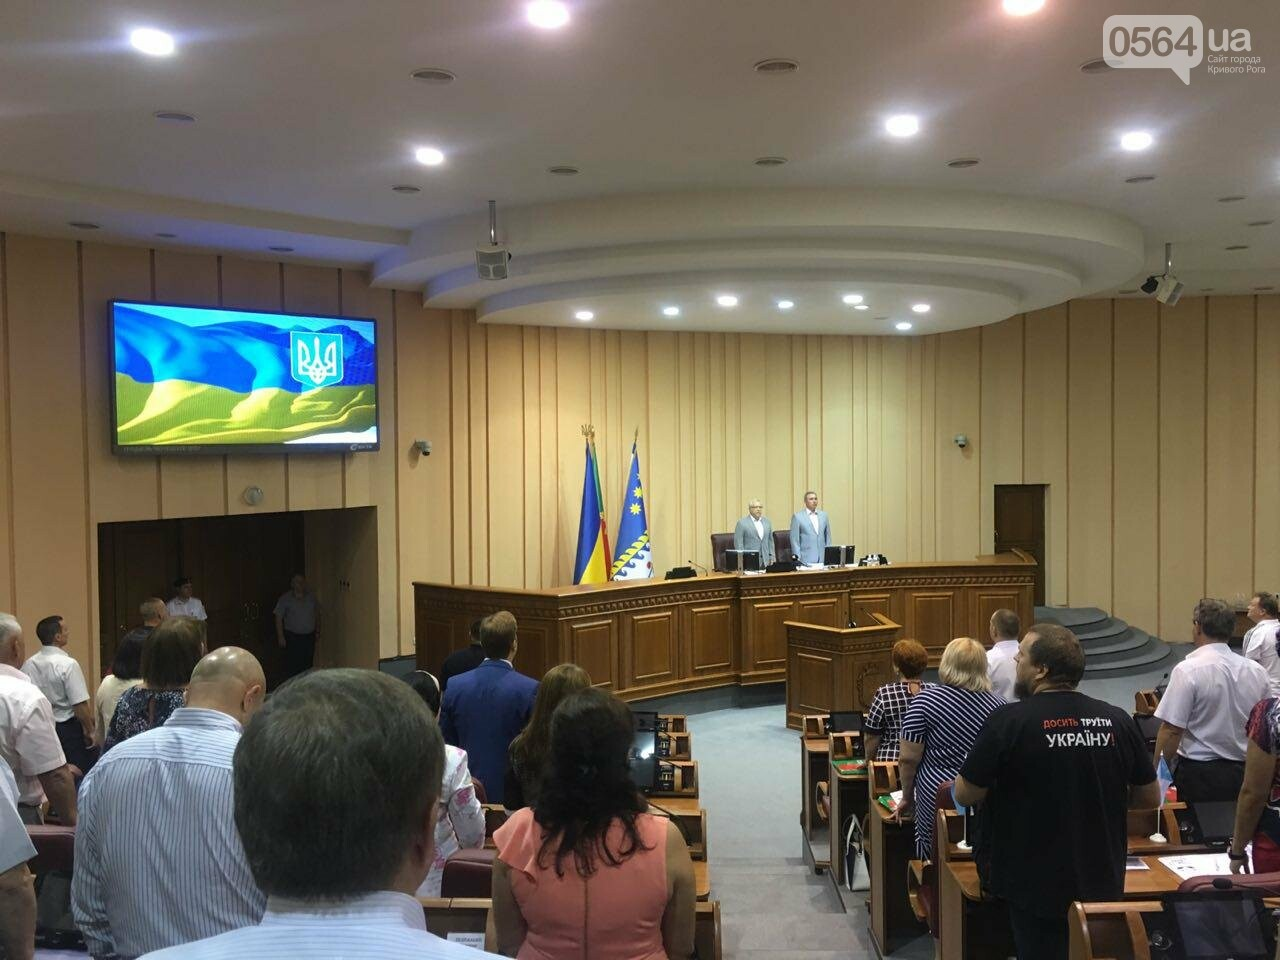 Криворожский горсовет не поддержал петицию о запрете Марша равенства, - ФОТО, фото-5